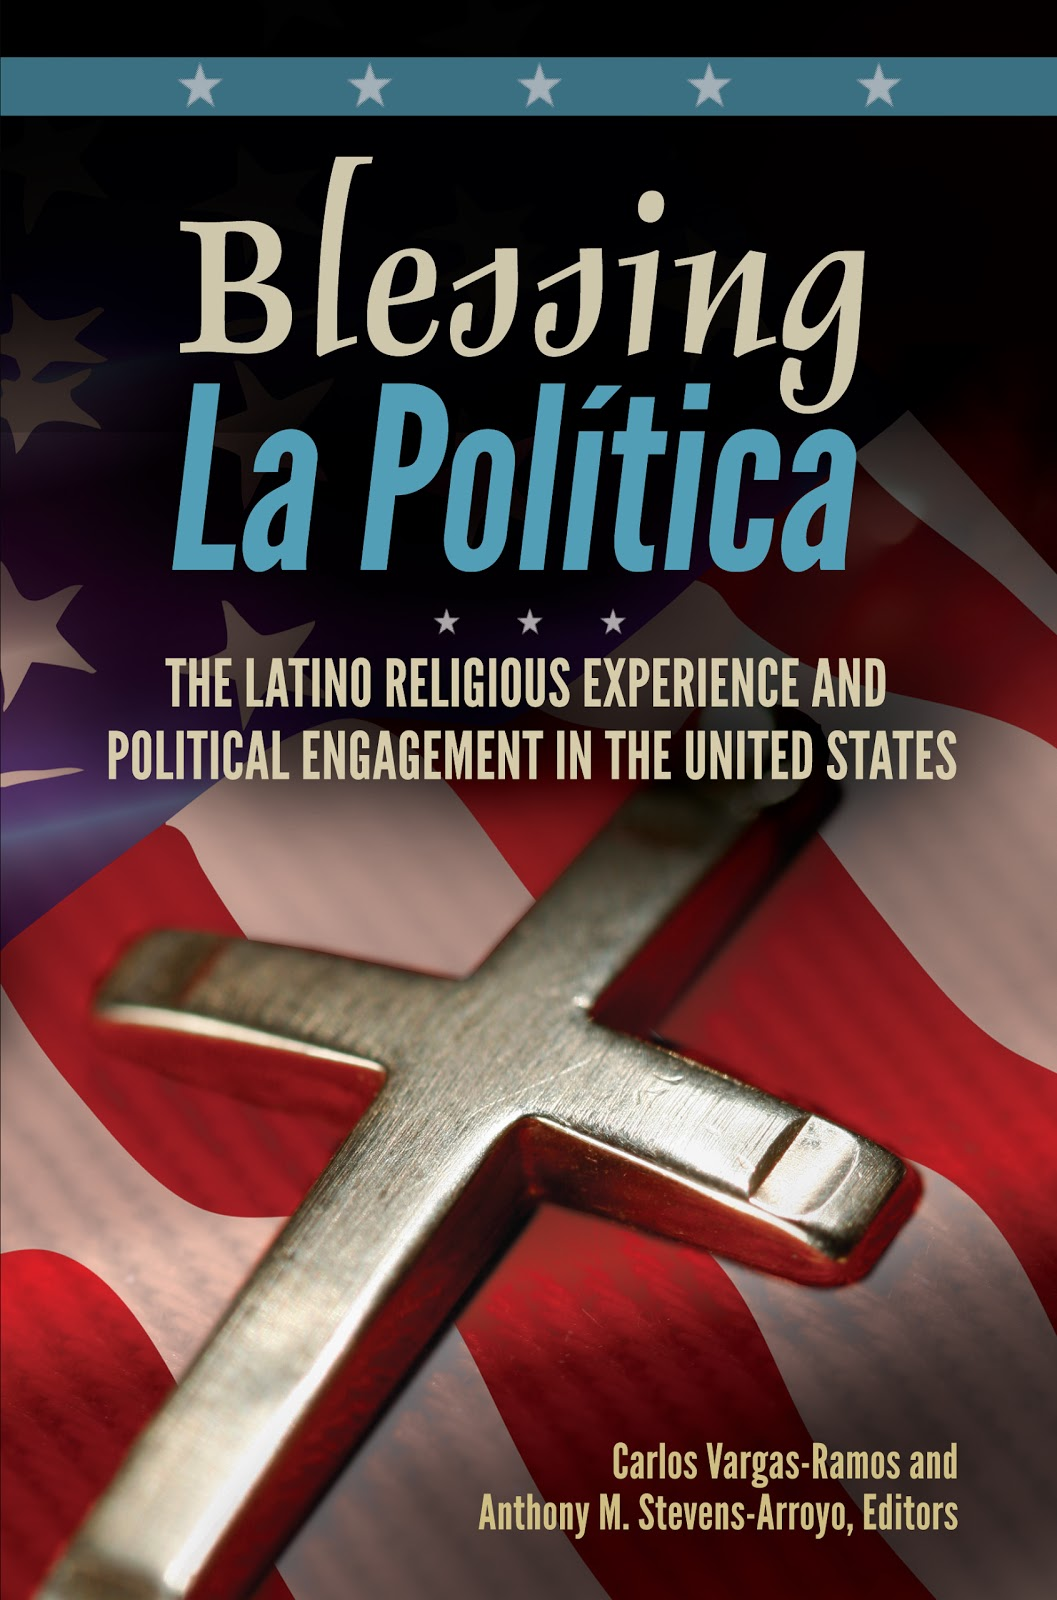 politics in american religion today essay